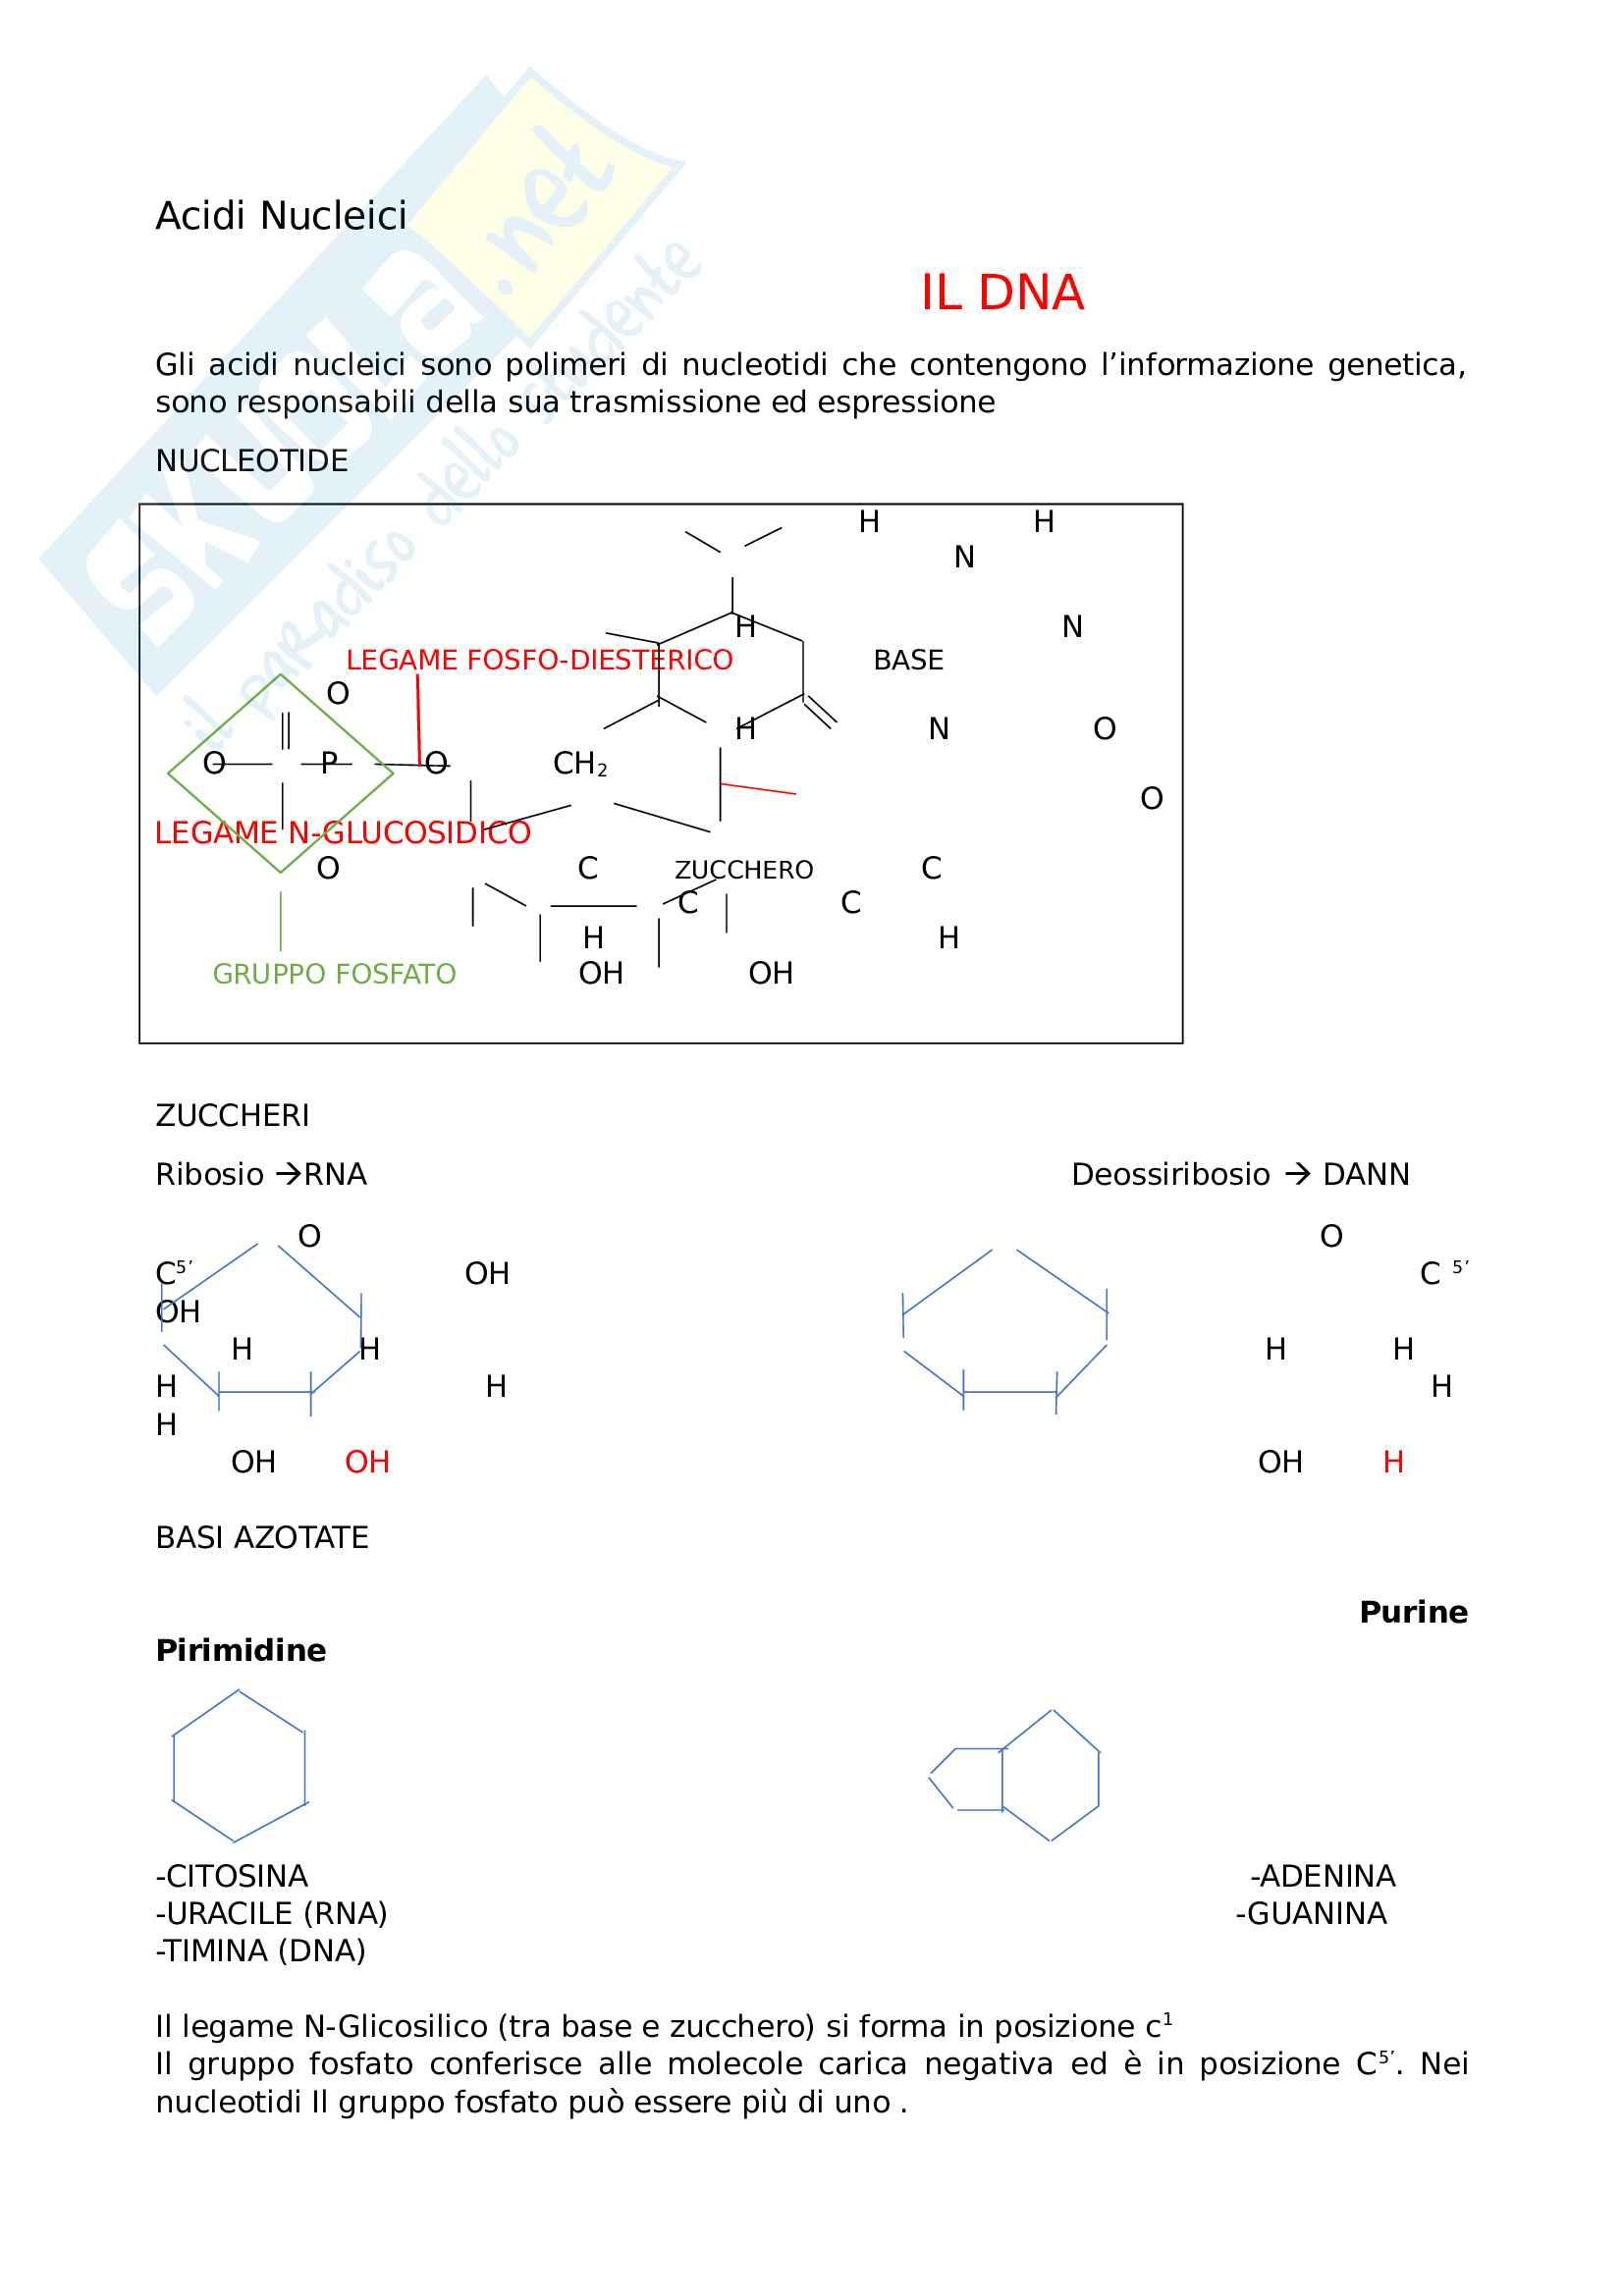 Appunti biologia cellulare - Acidi nucleici